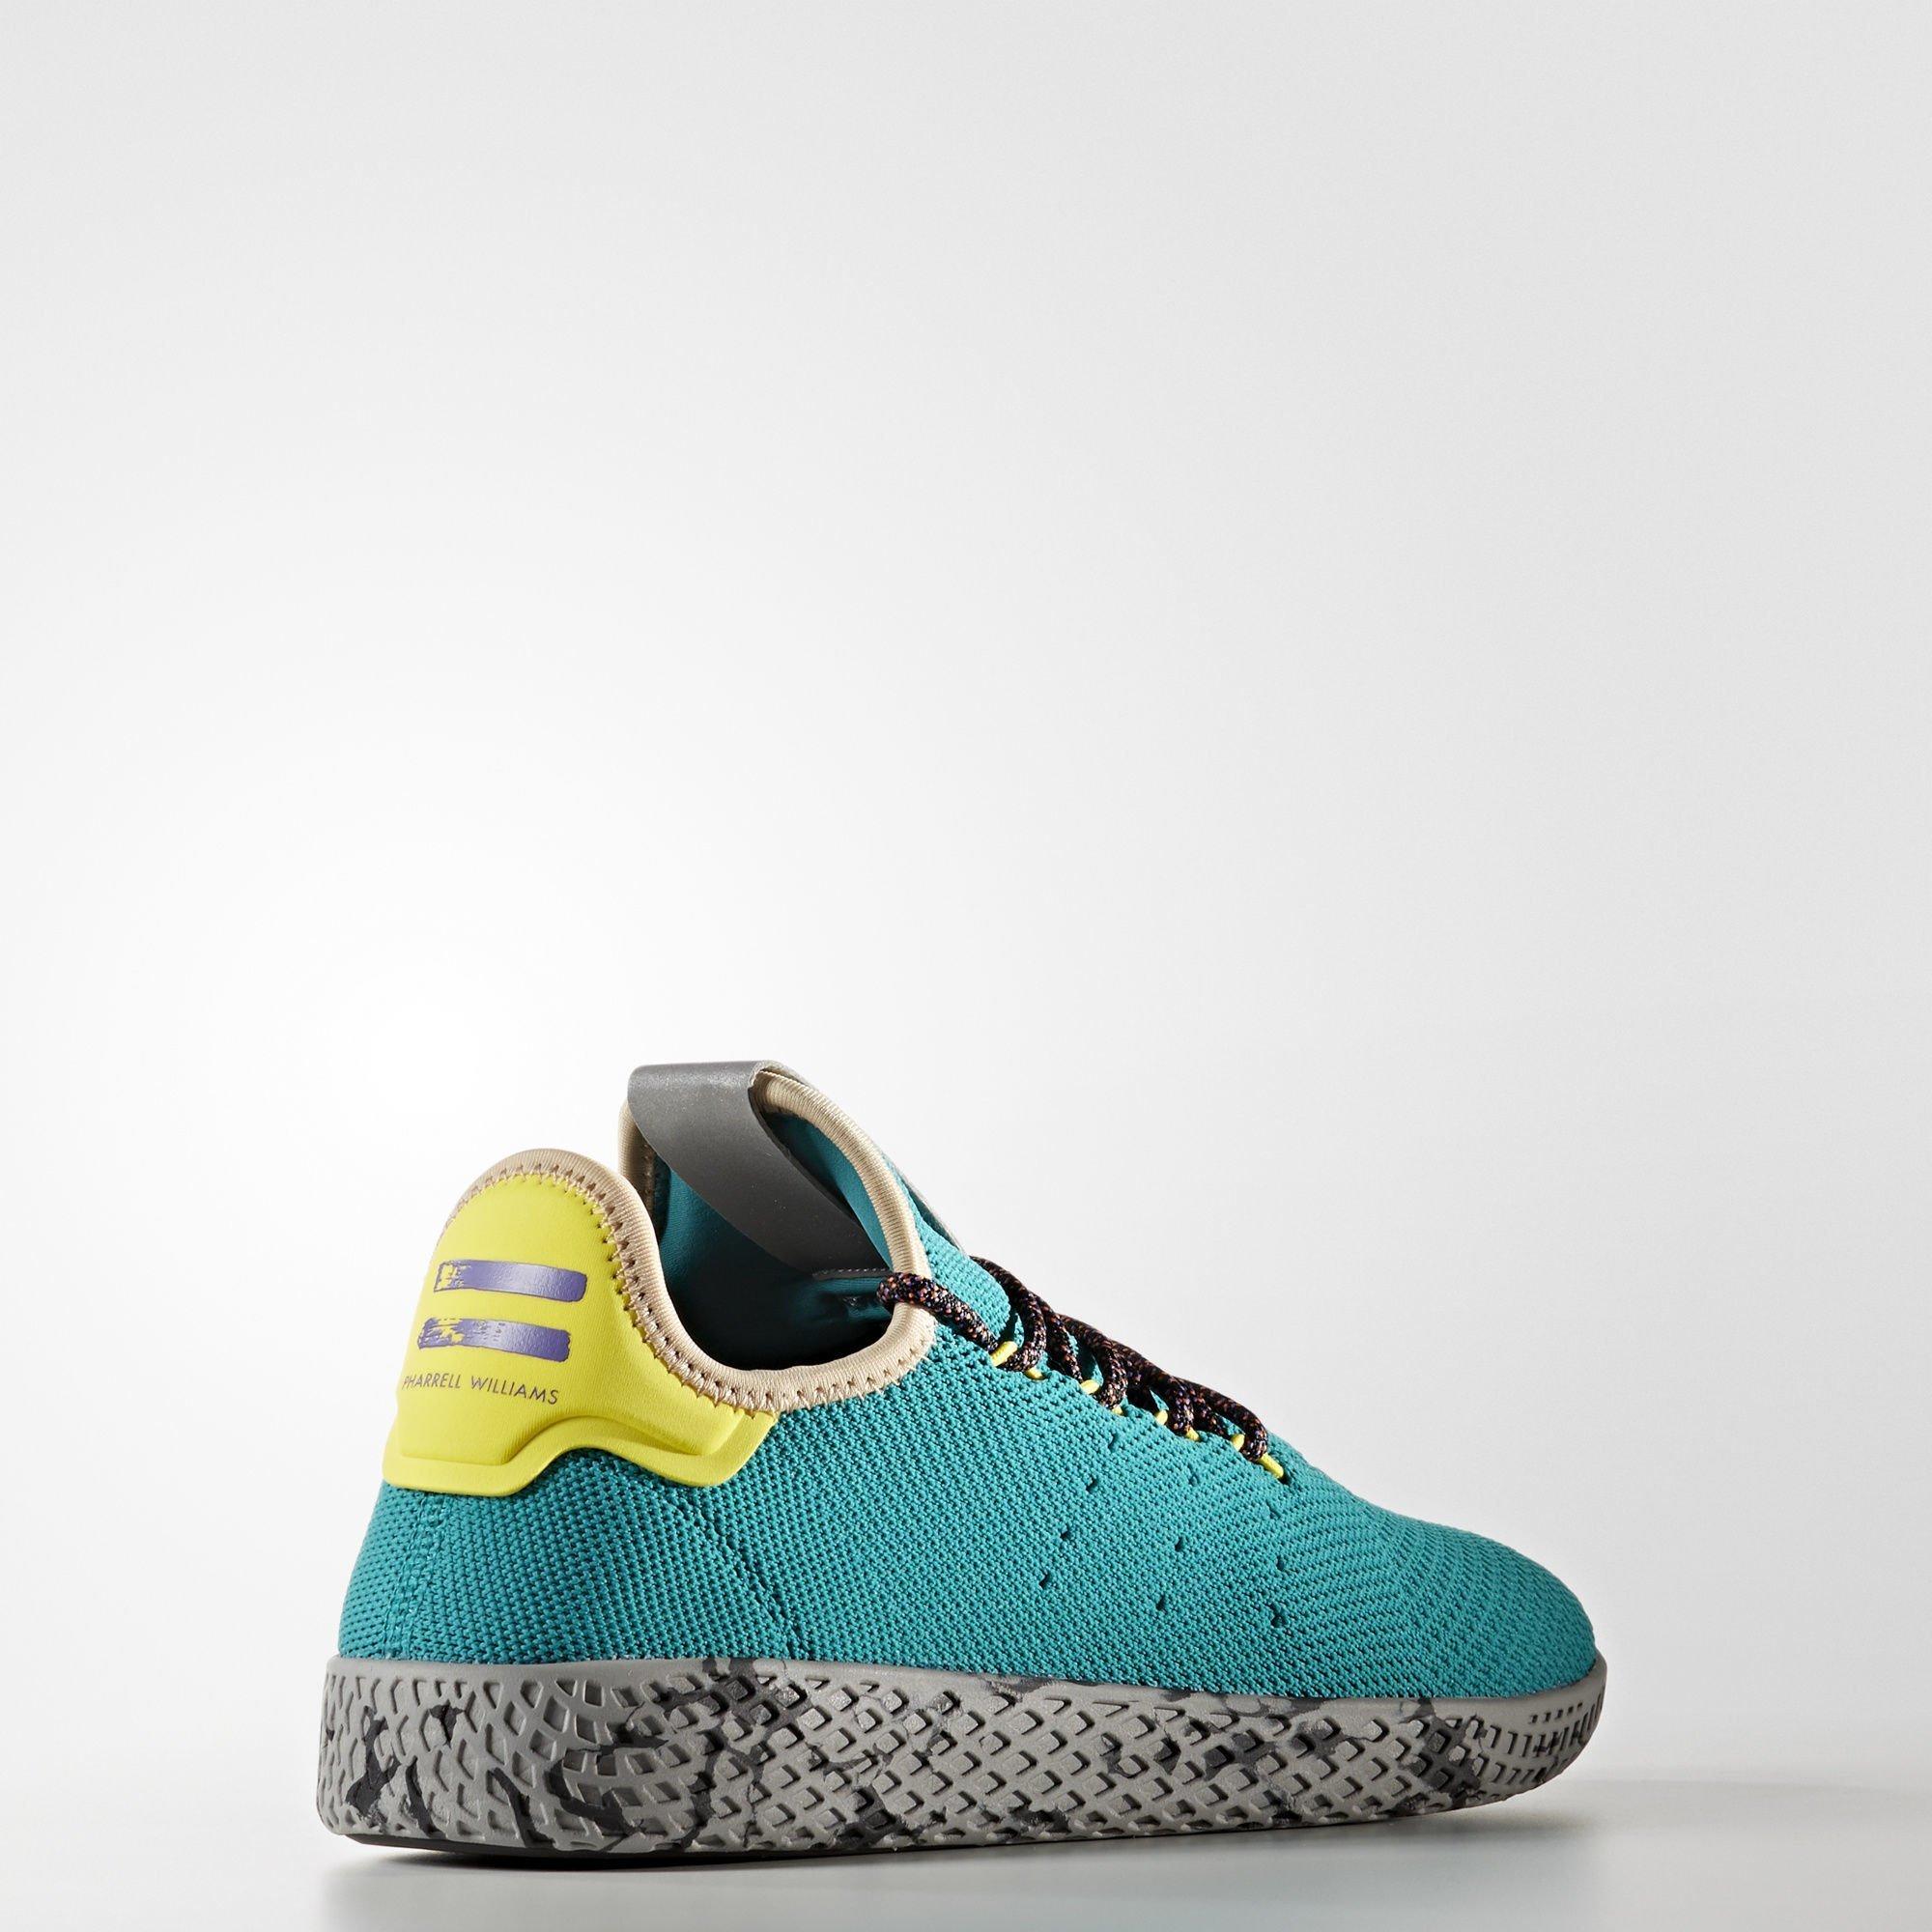 Pharrell x adidas Tennis HU Teal (CQ1872)